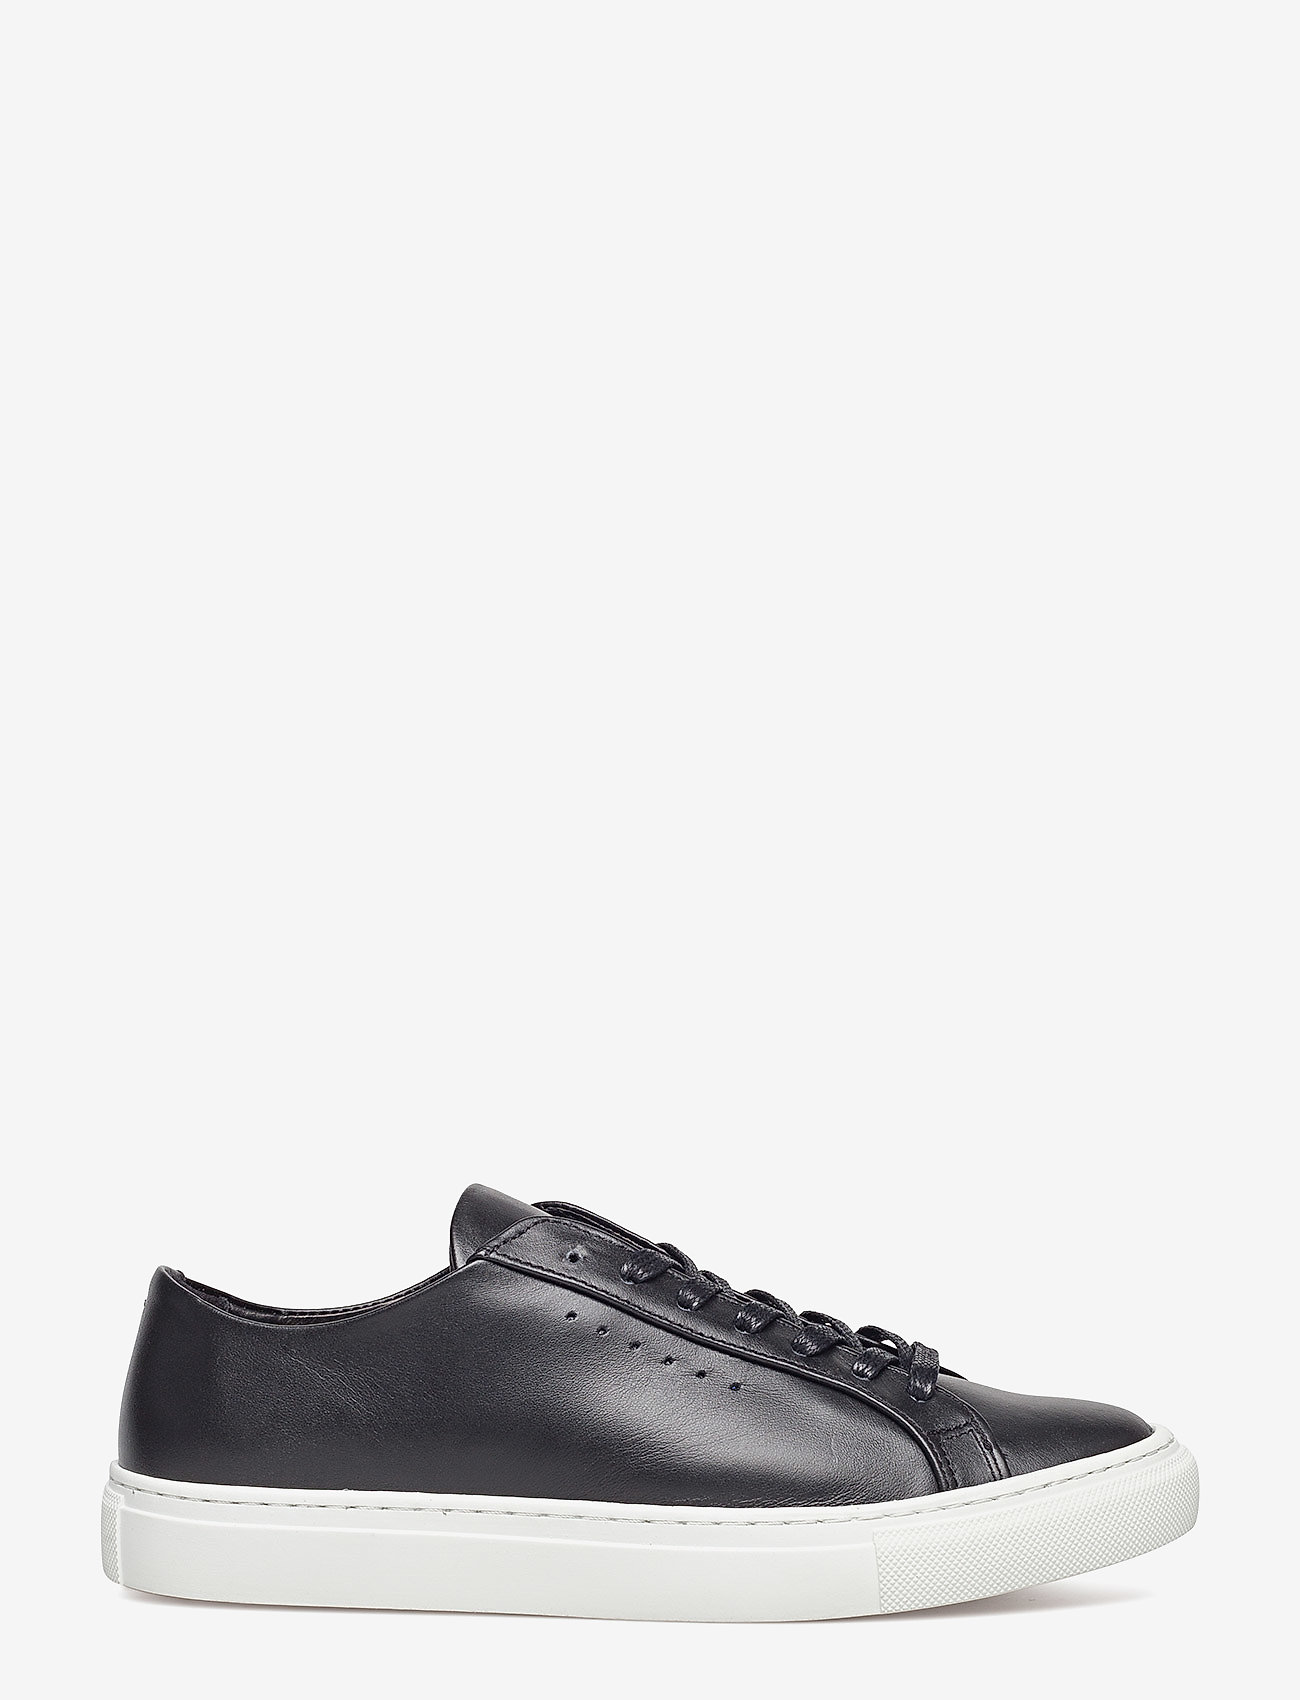 Filippa K - Kate Low Sneaker - sportiska stila apavi ar pazeminātu potītes daļu - black/whit - 1